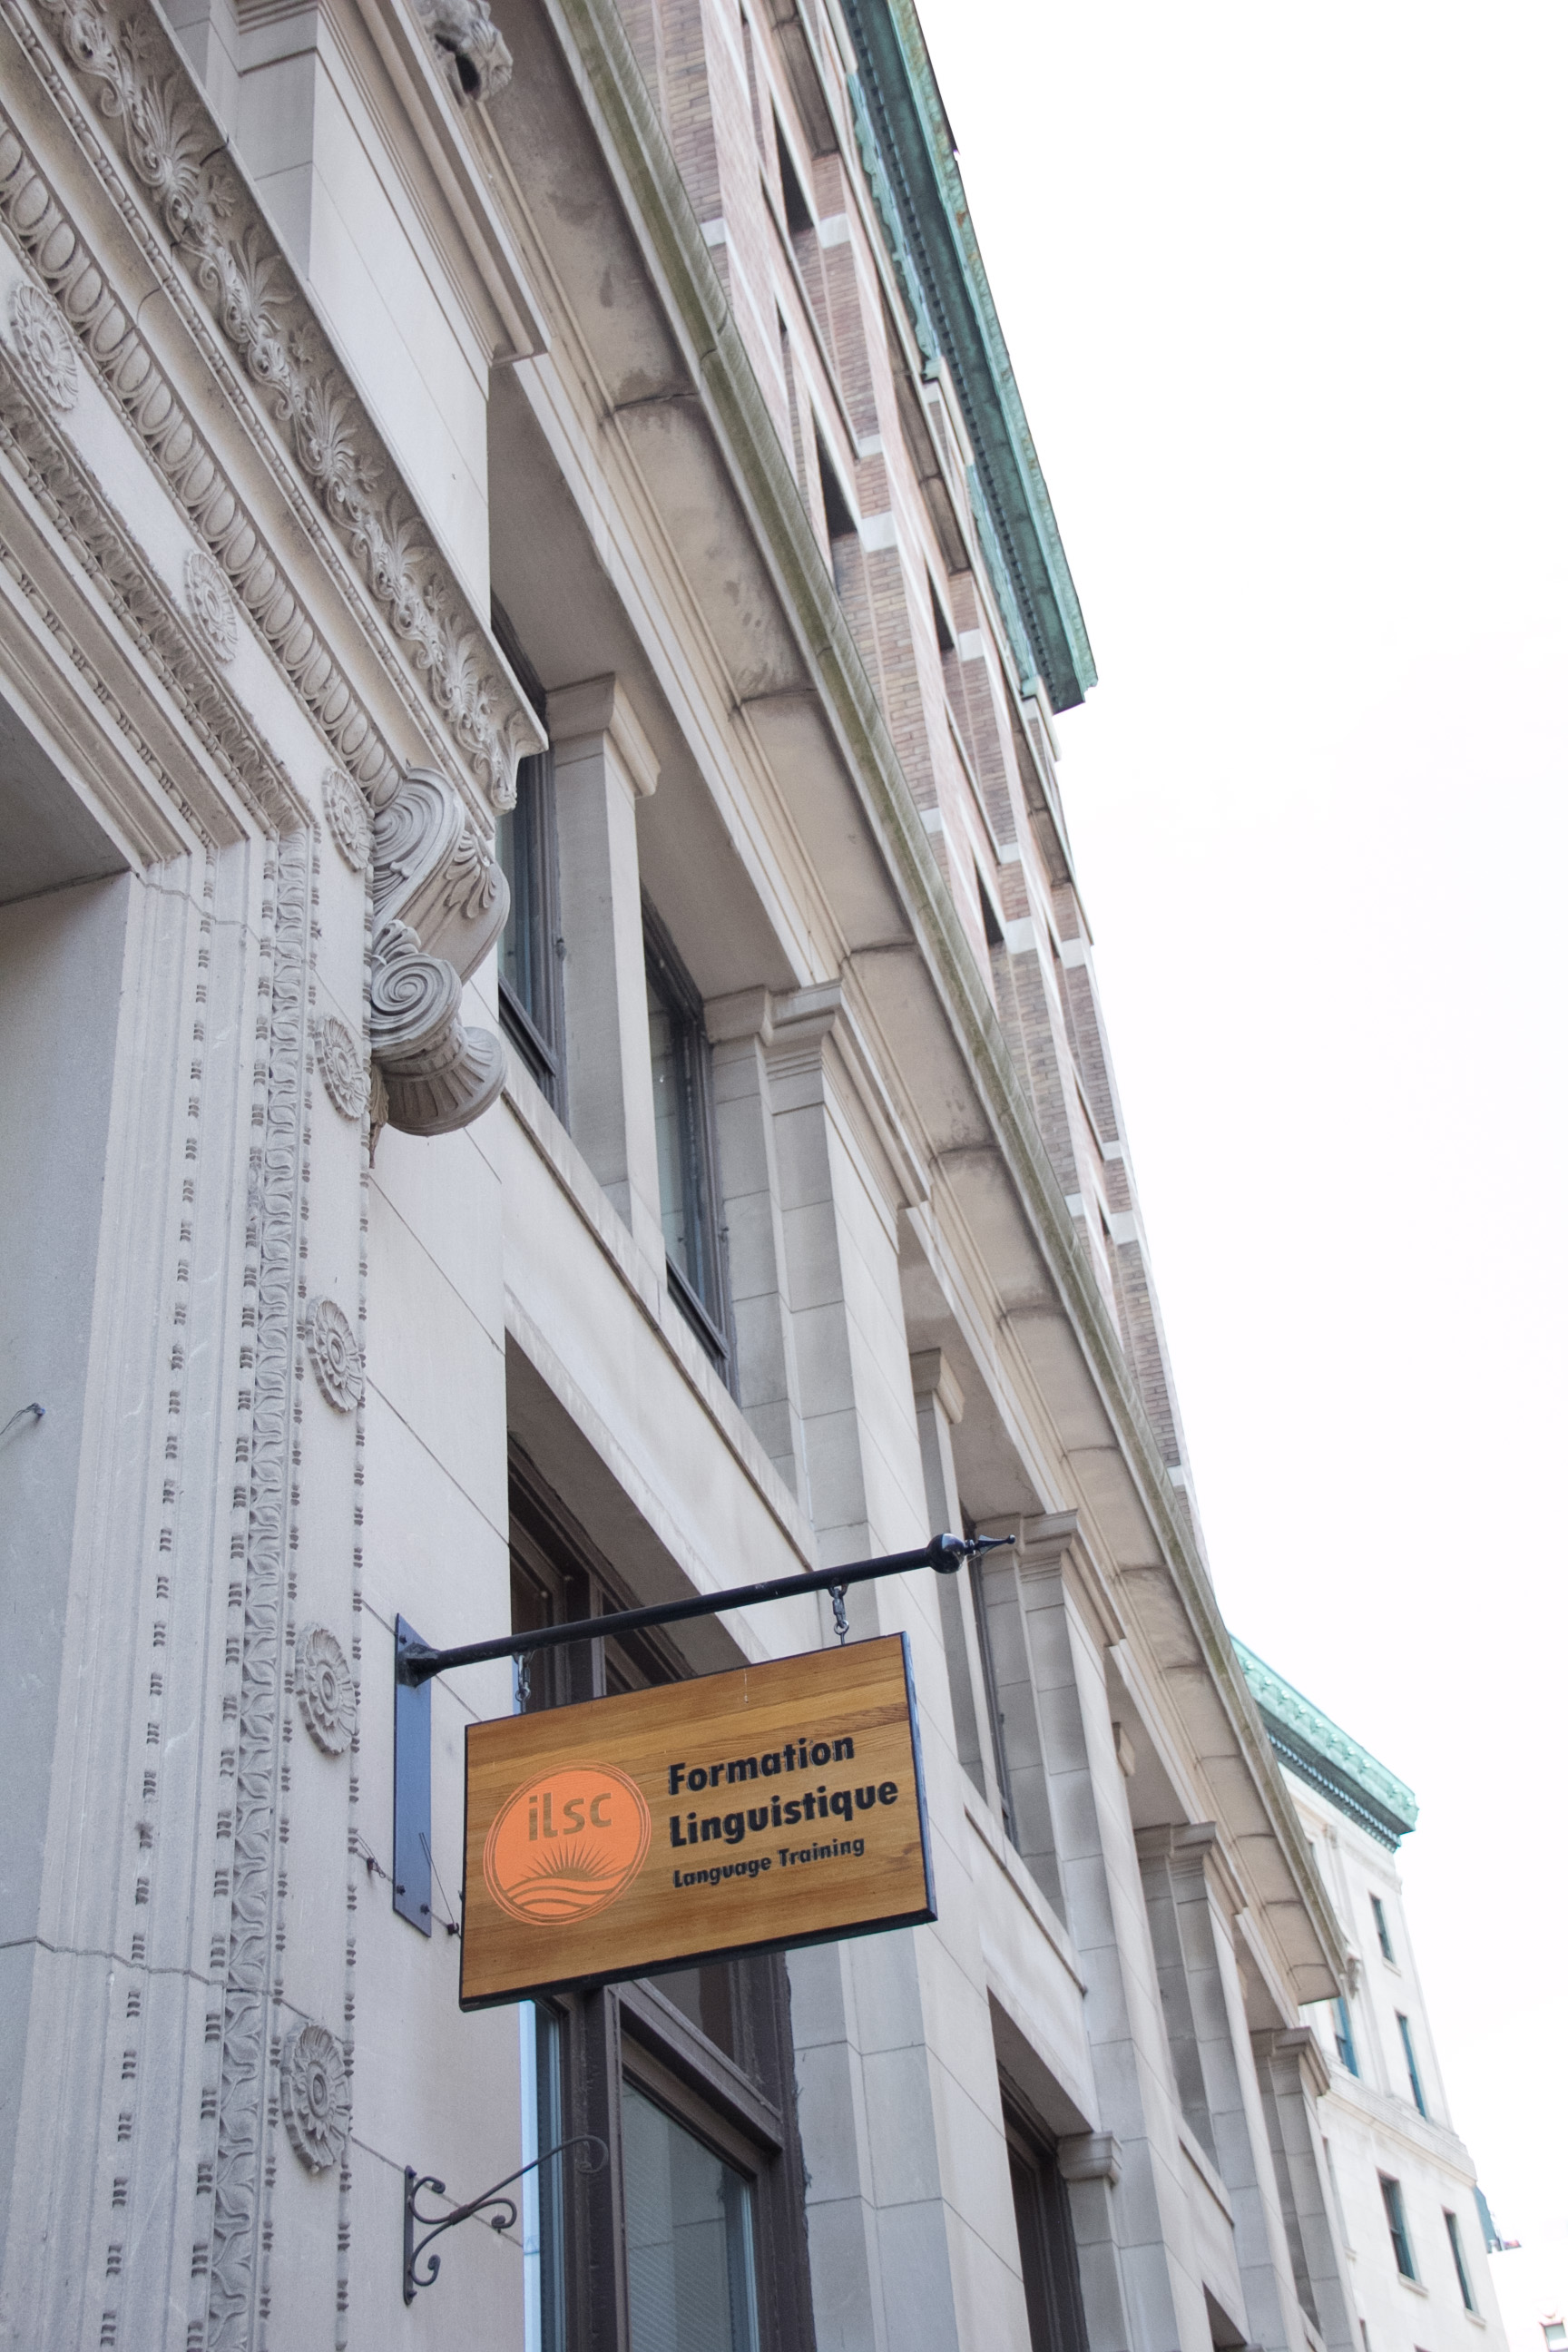 ilsc-montreal-campus-building